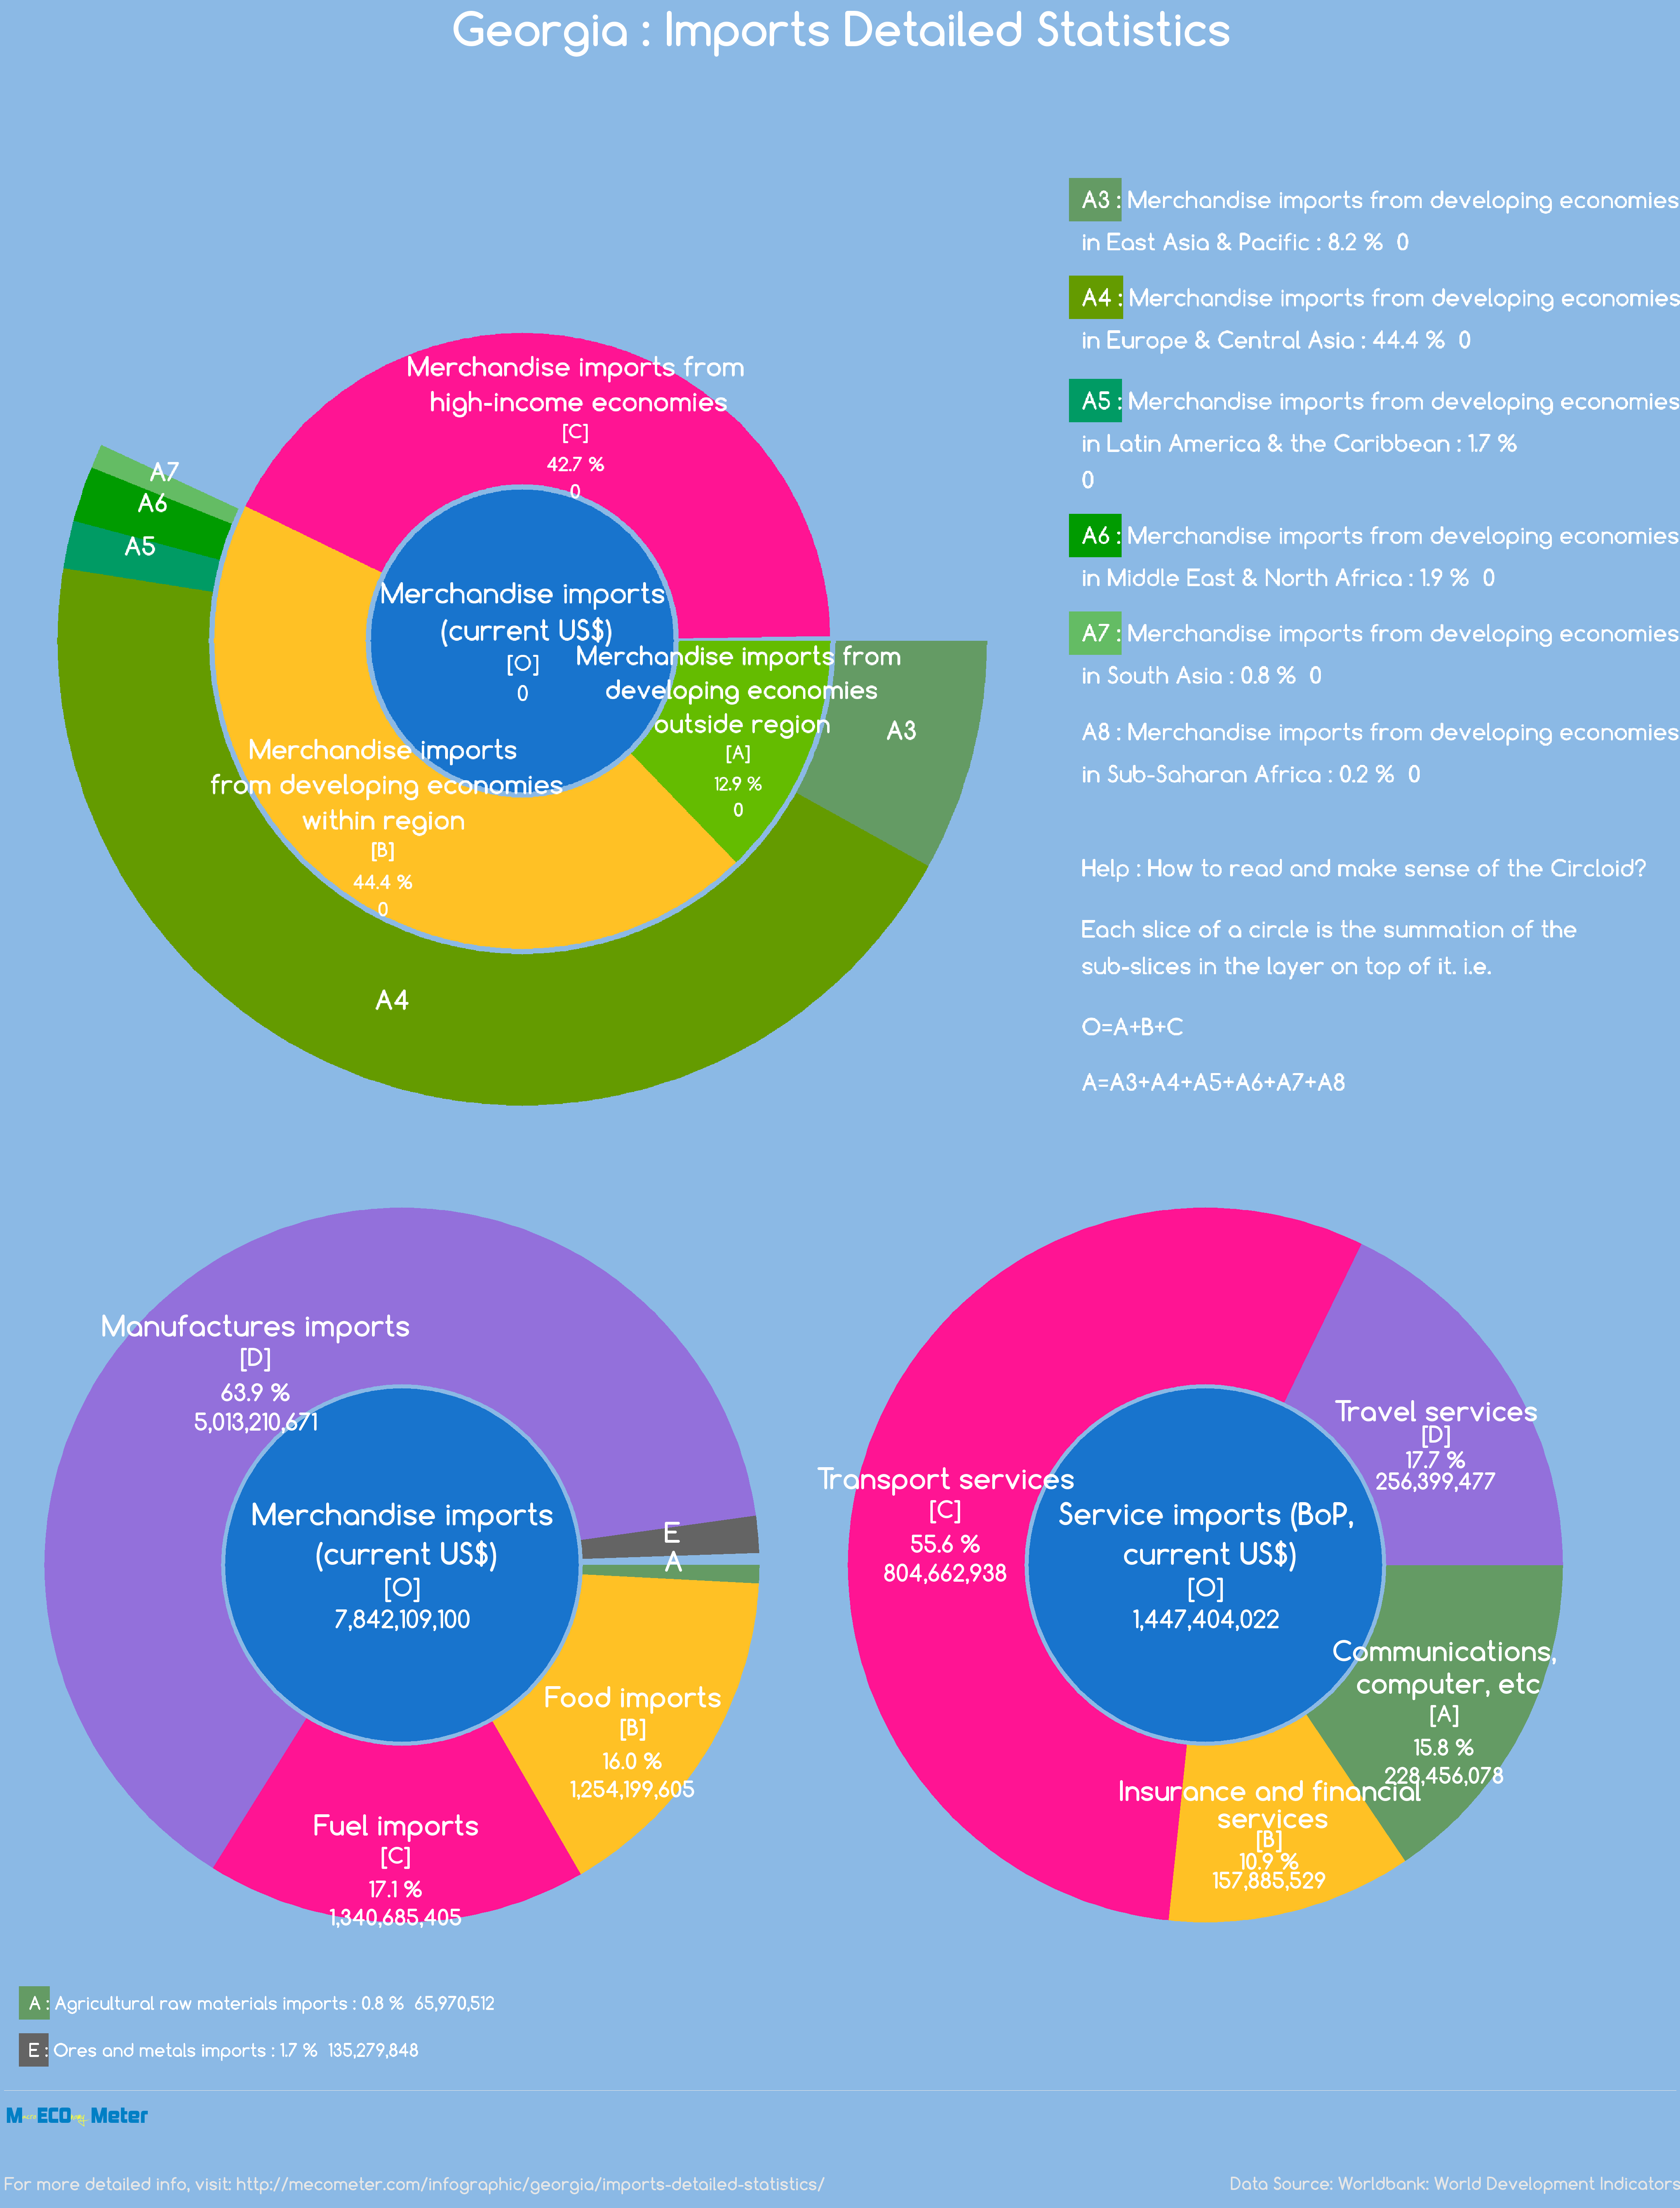 Georgia : Imports Detailed Statistics